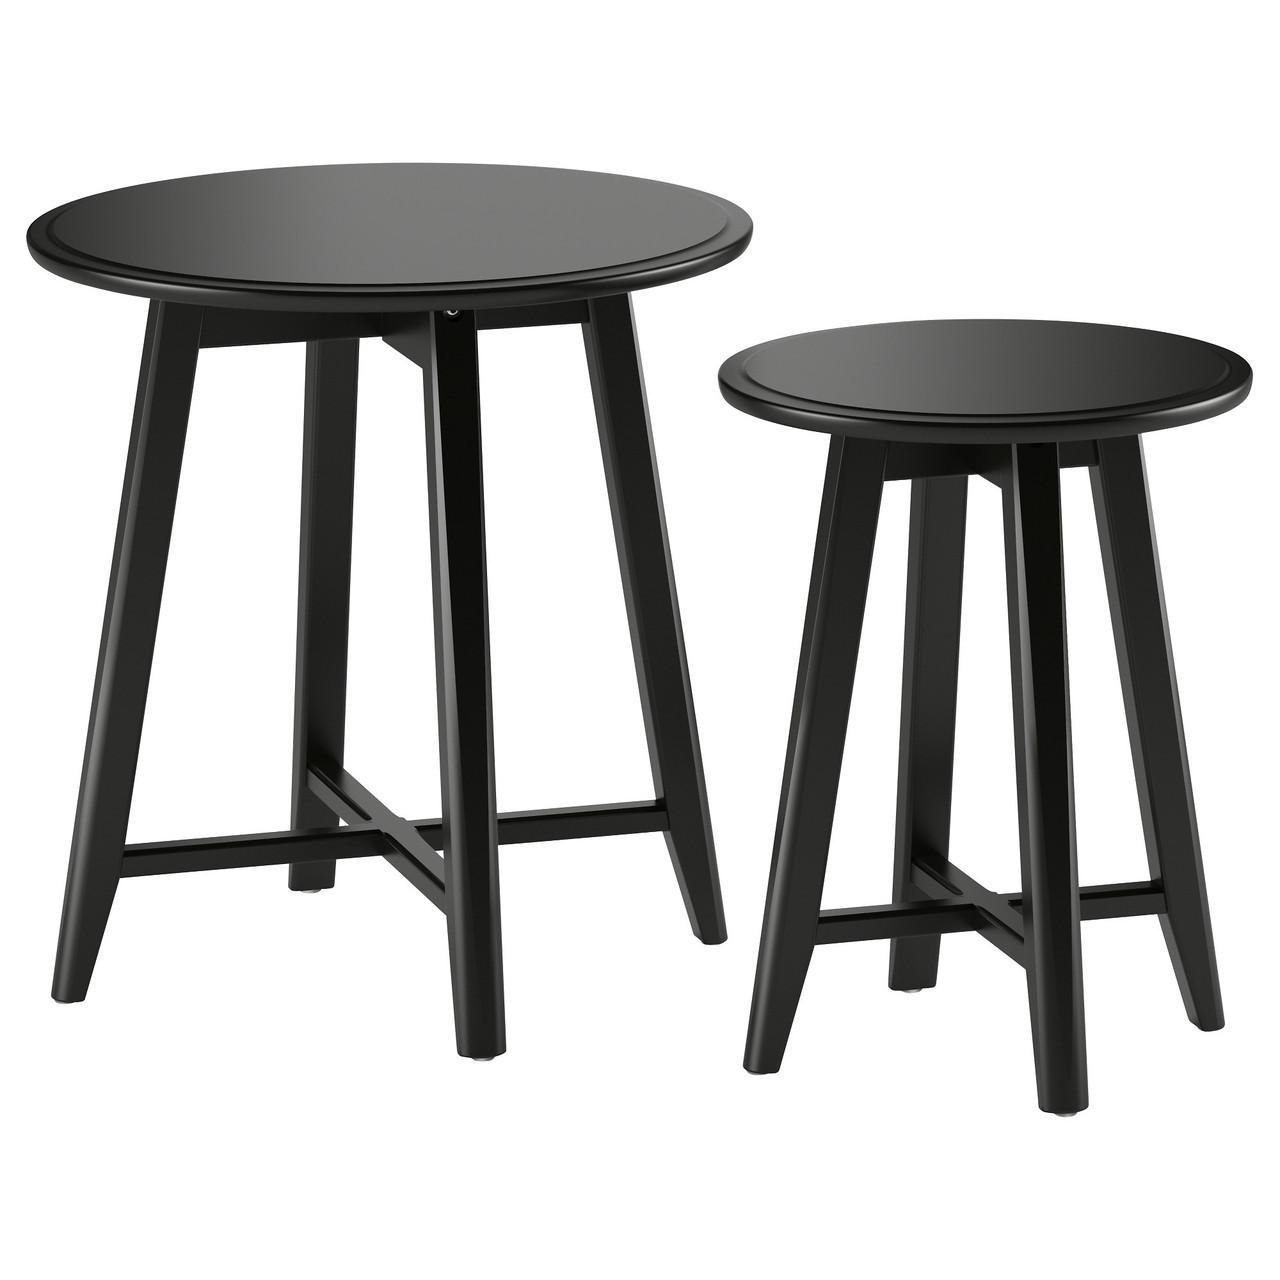 IKEA KRAGSTA (002.998.25) Столы, 2 шт., Черный